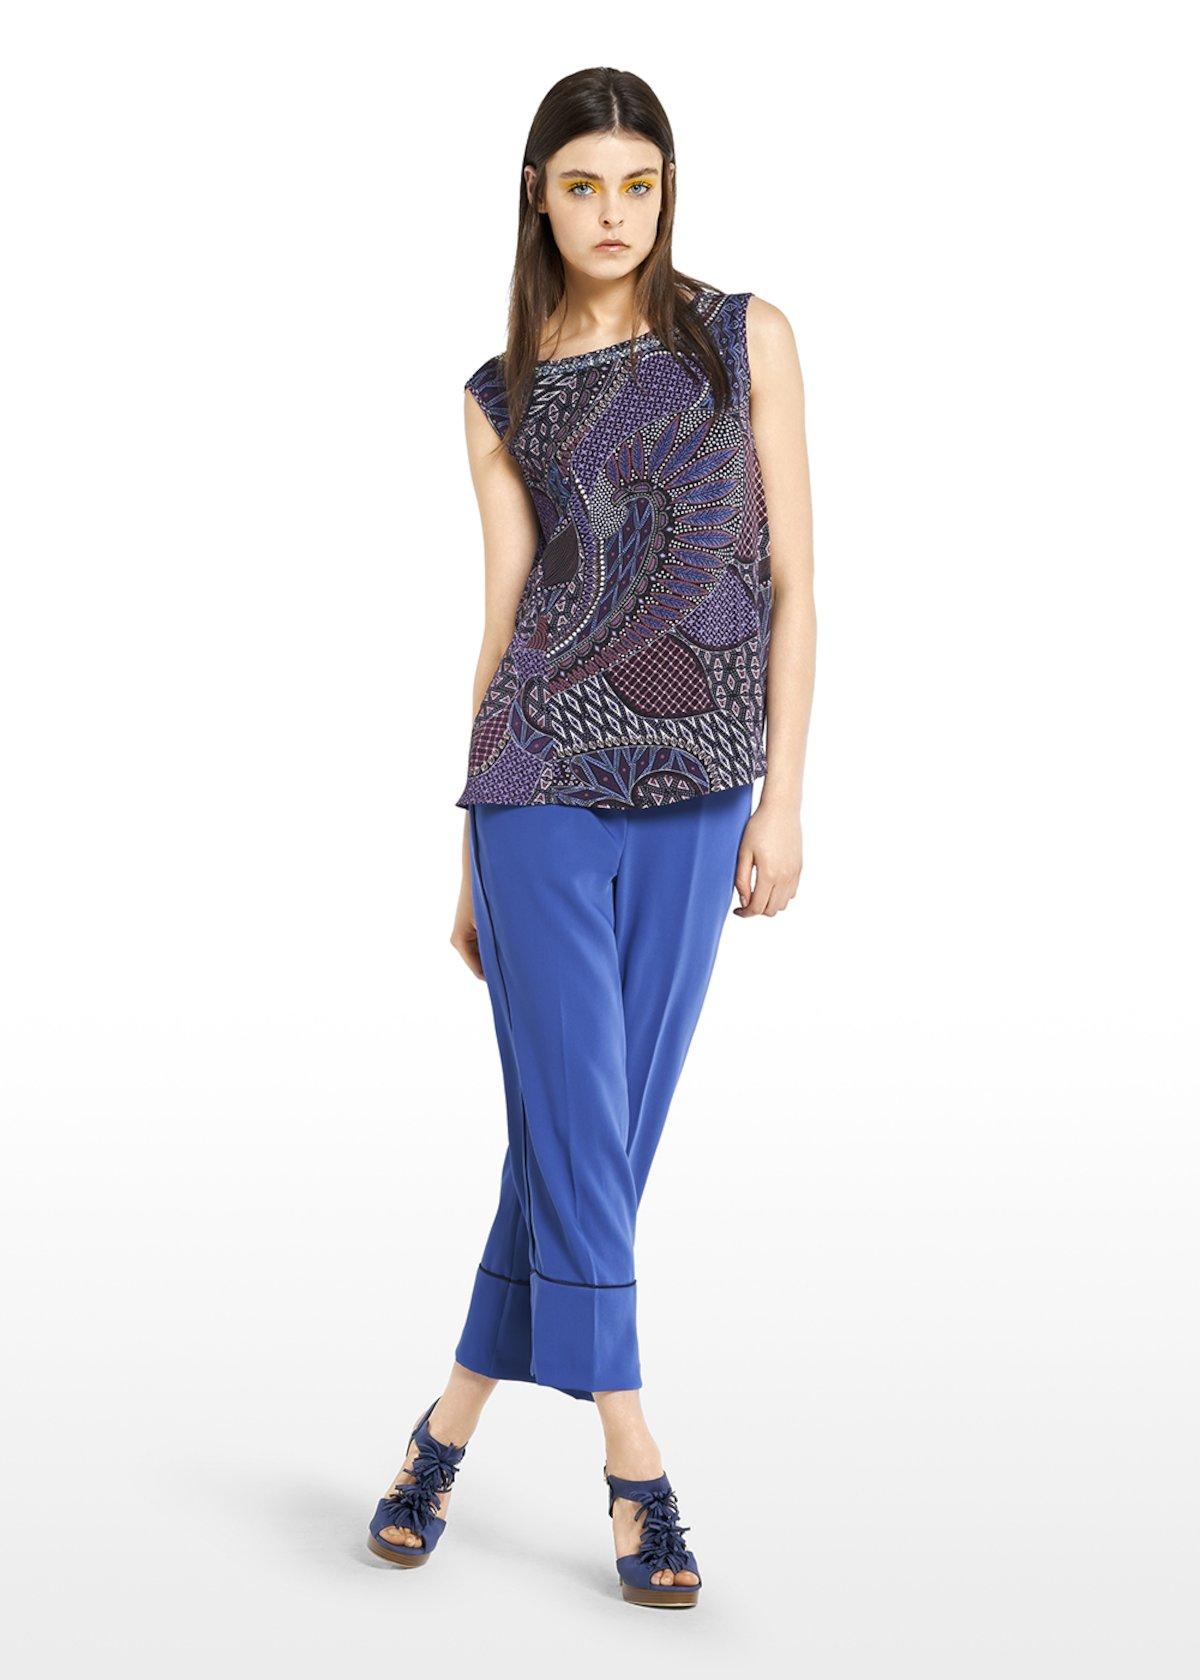 Top Thor henna pattern with neckline applications - Melanzana / Lapis Fantasia - Woman